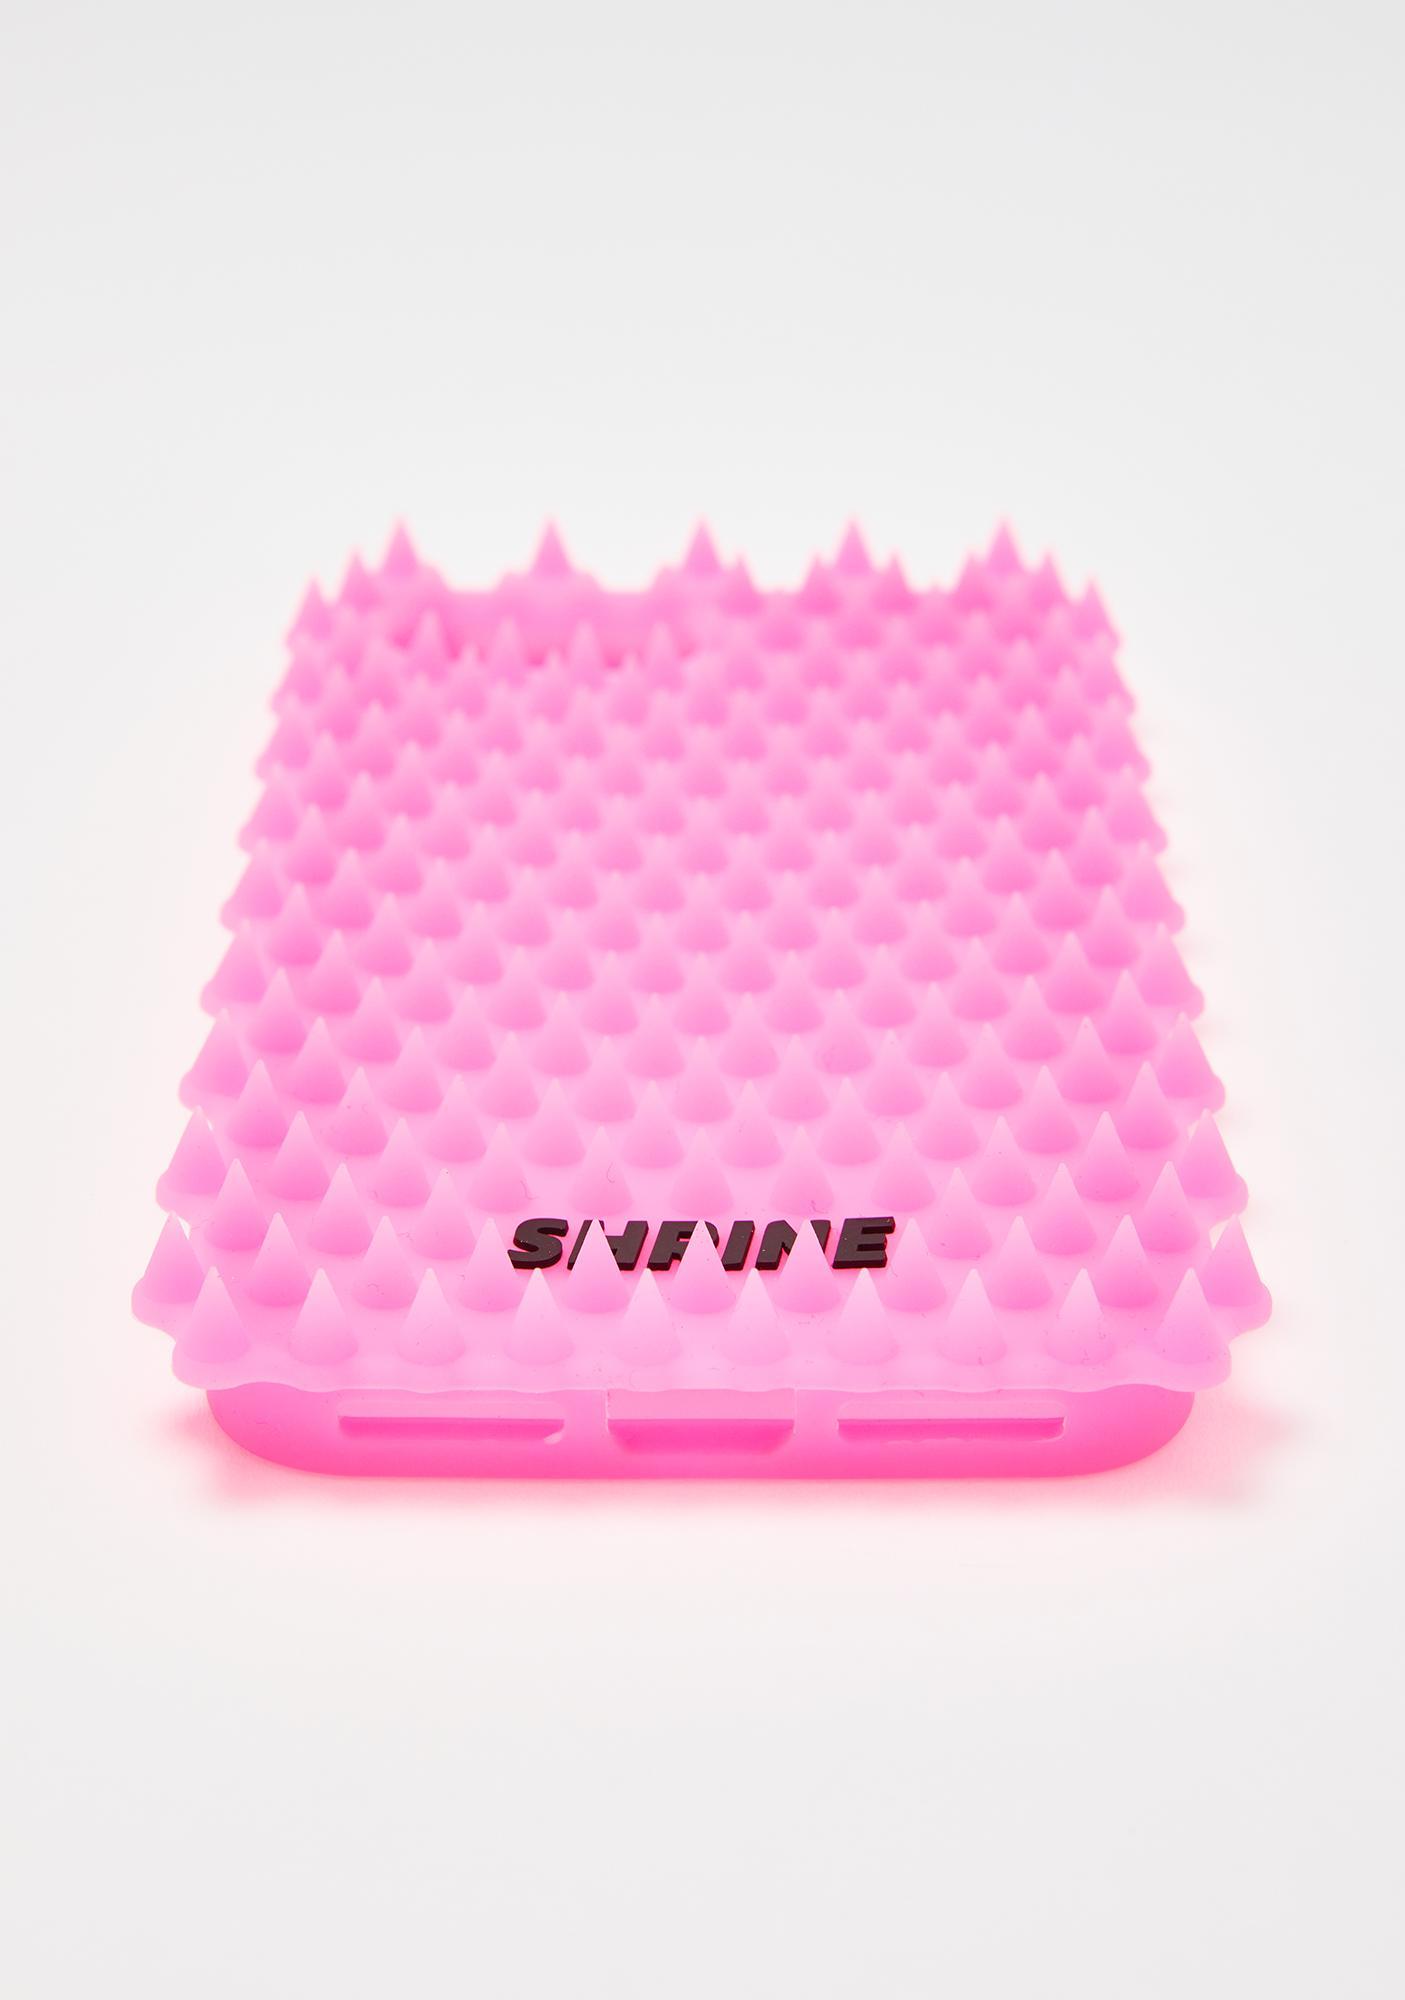 Shrine Neon Pink Phone Case